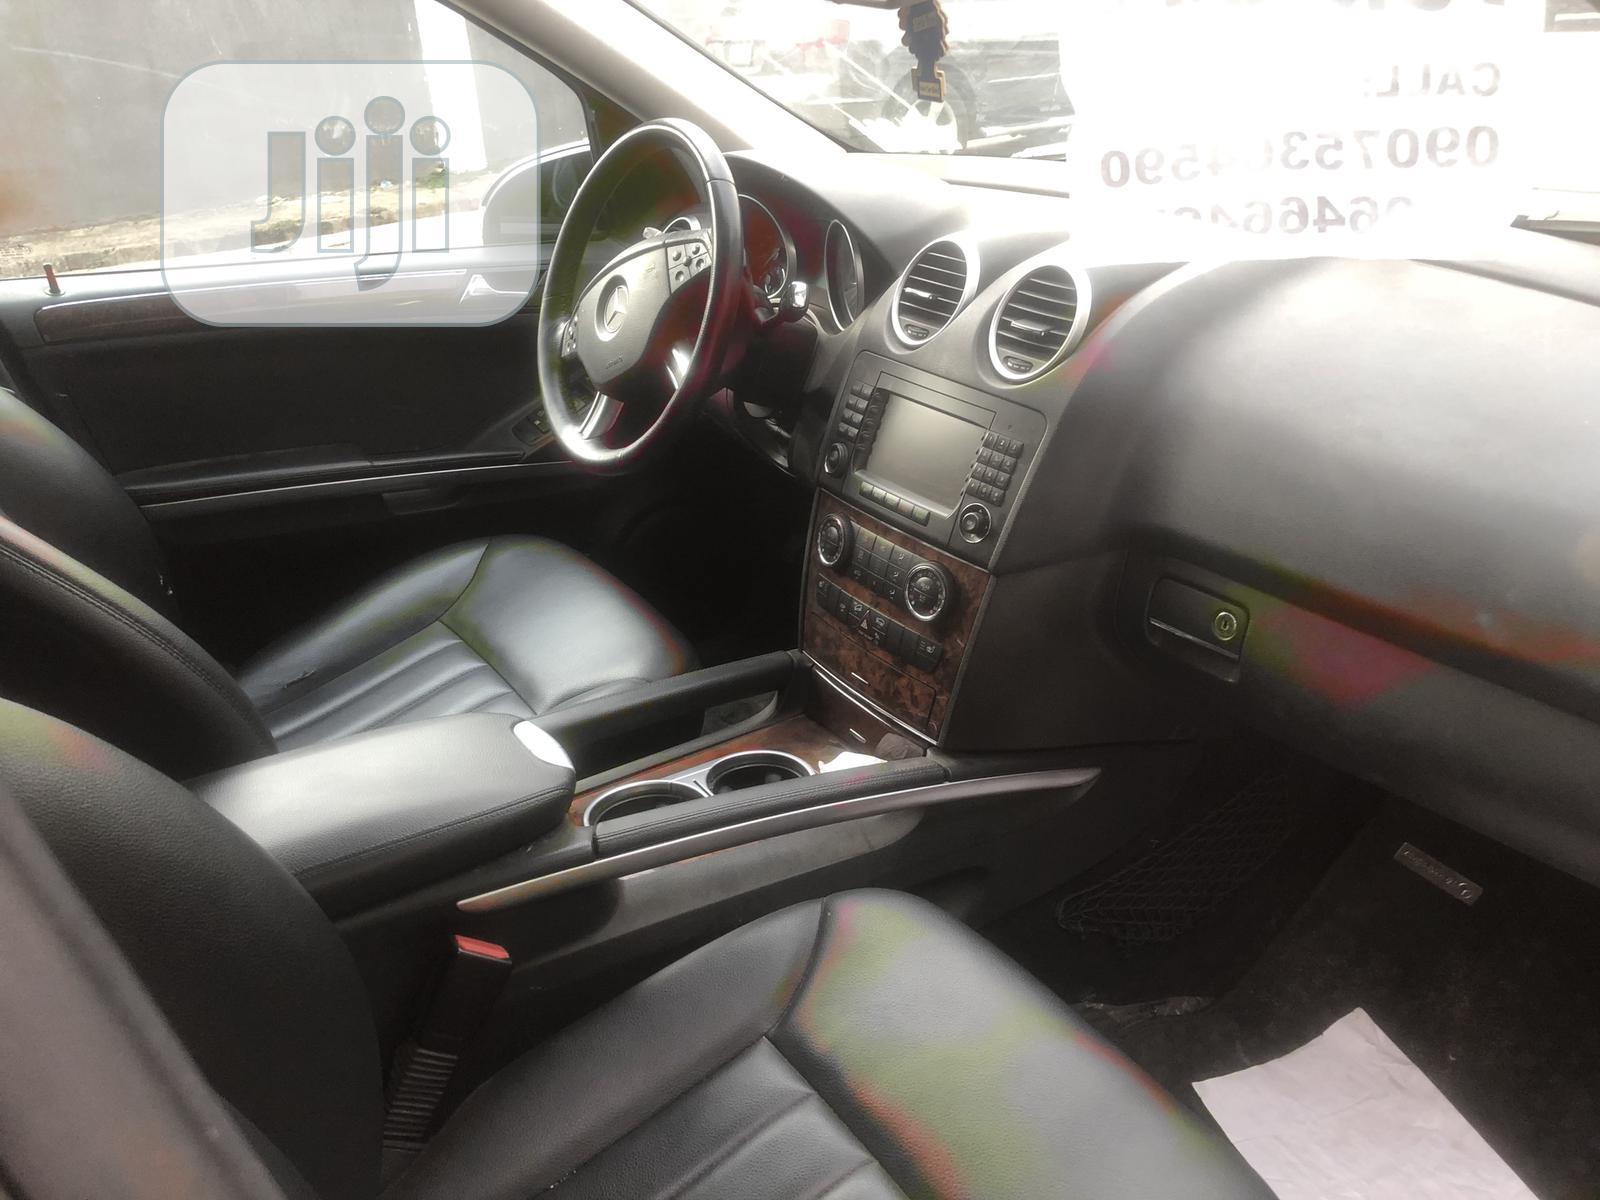 Mercedes-Benz M Class 2007 ML 500 4Matic Black | Cars for sale in Owerri, Imo State, Nigeria